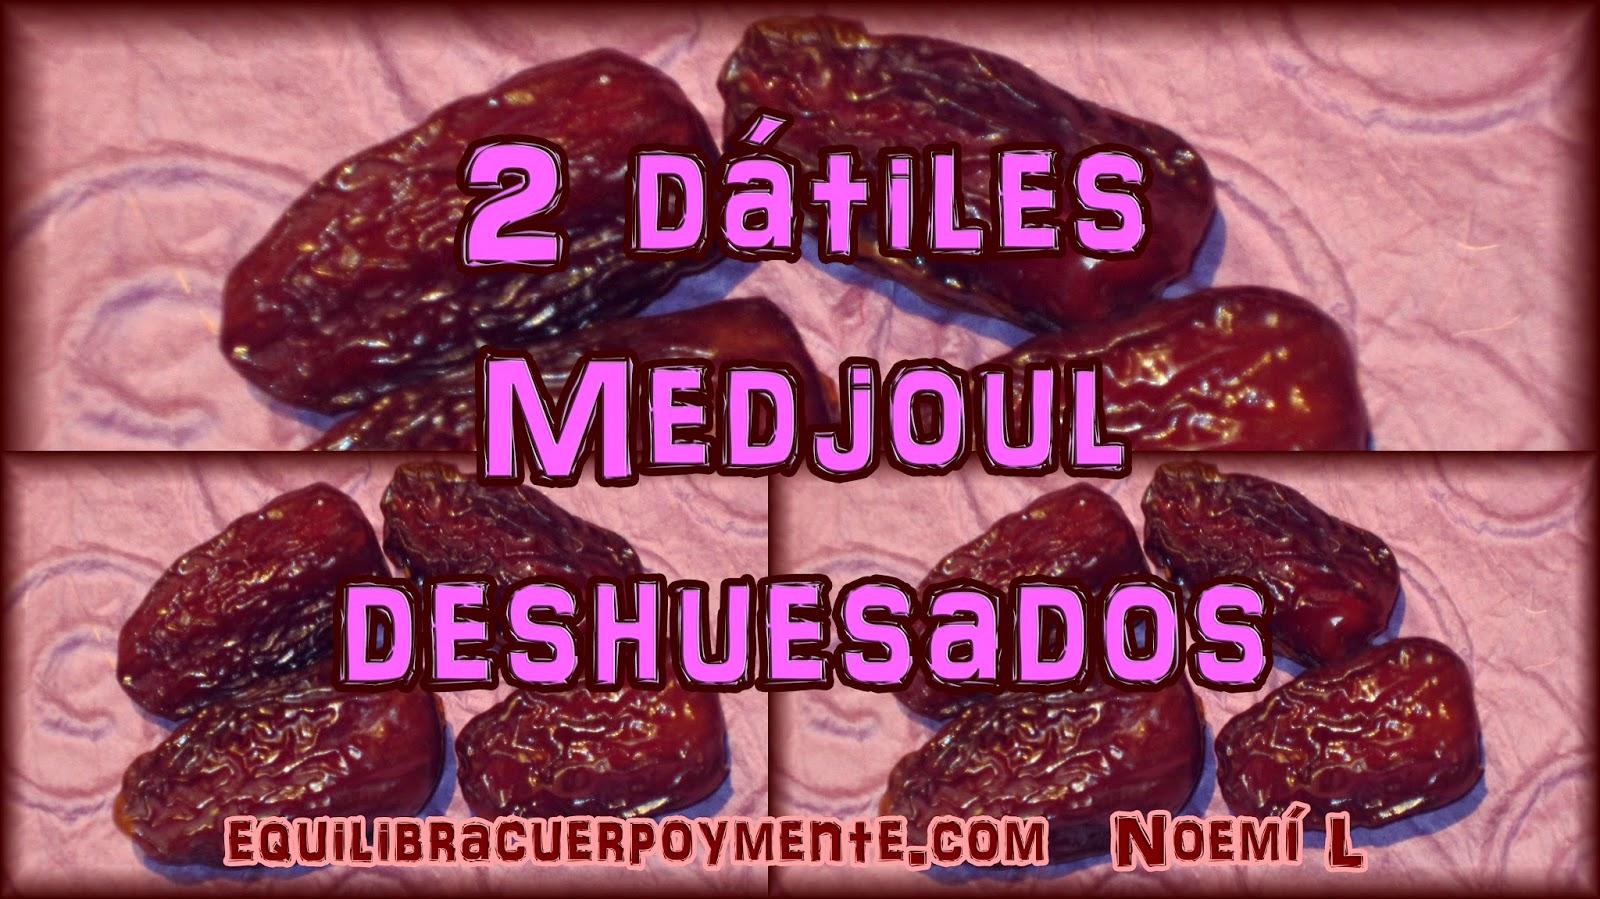 Datiles